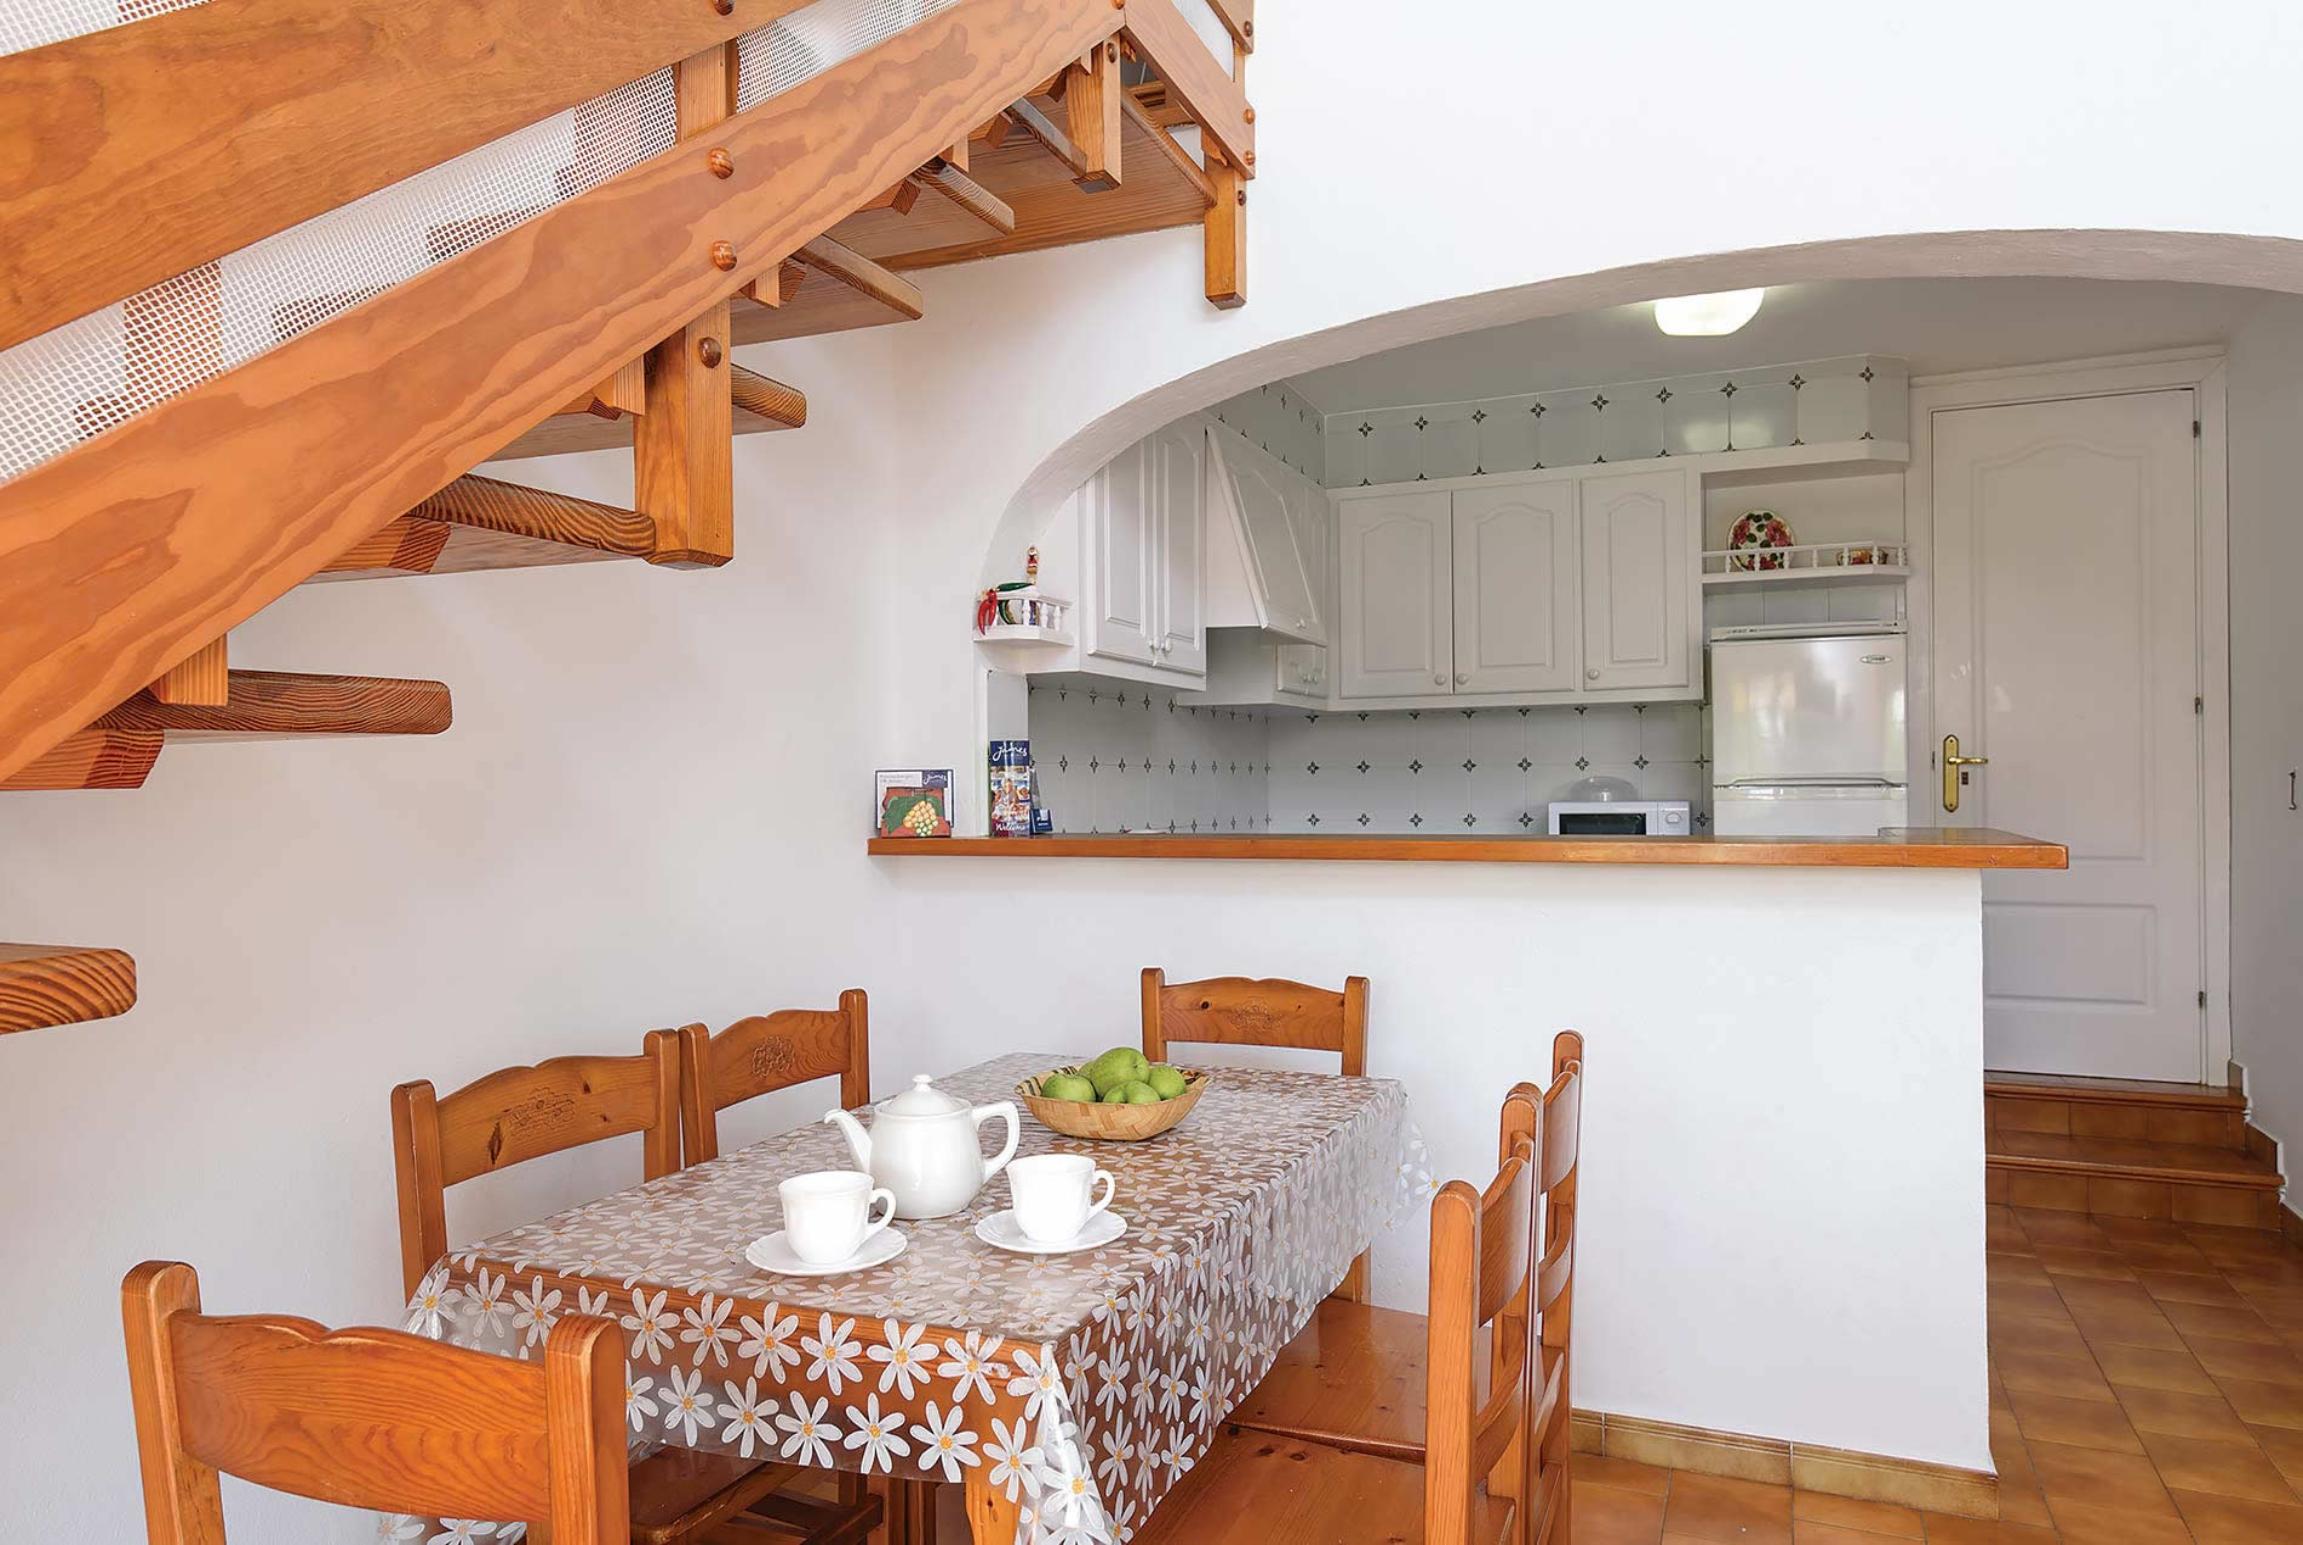 Ferienhaus Eulalia I (2653535), Arenal De'N Castell, Menorca, Balearische Inseln, Spanien, Bild 11